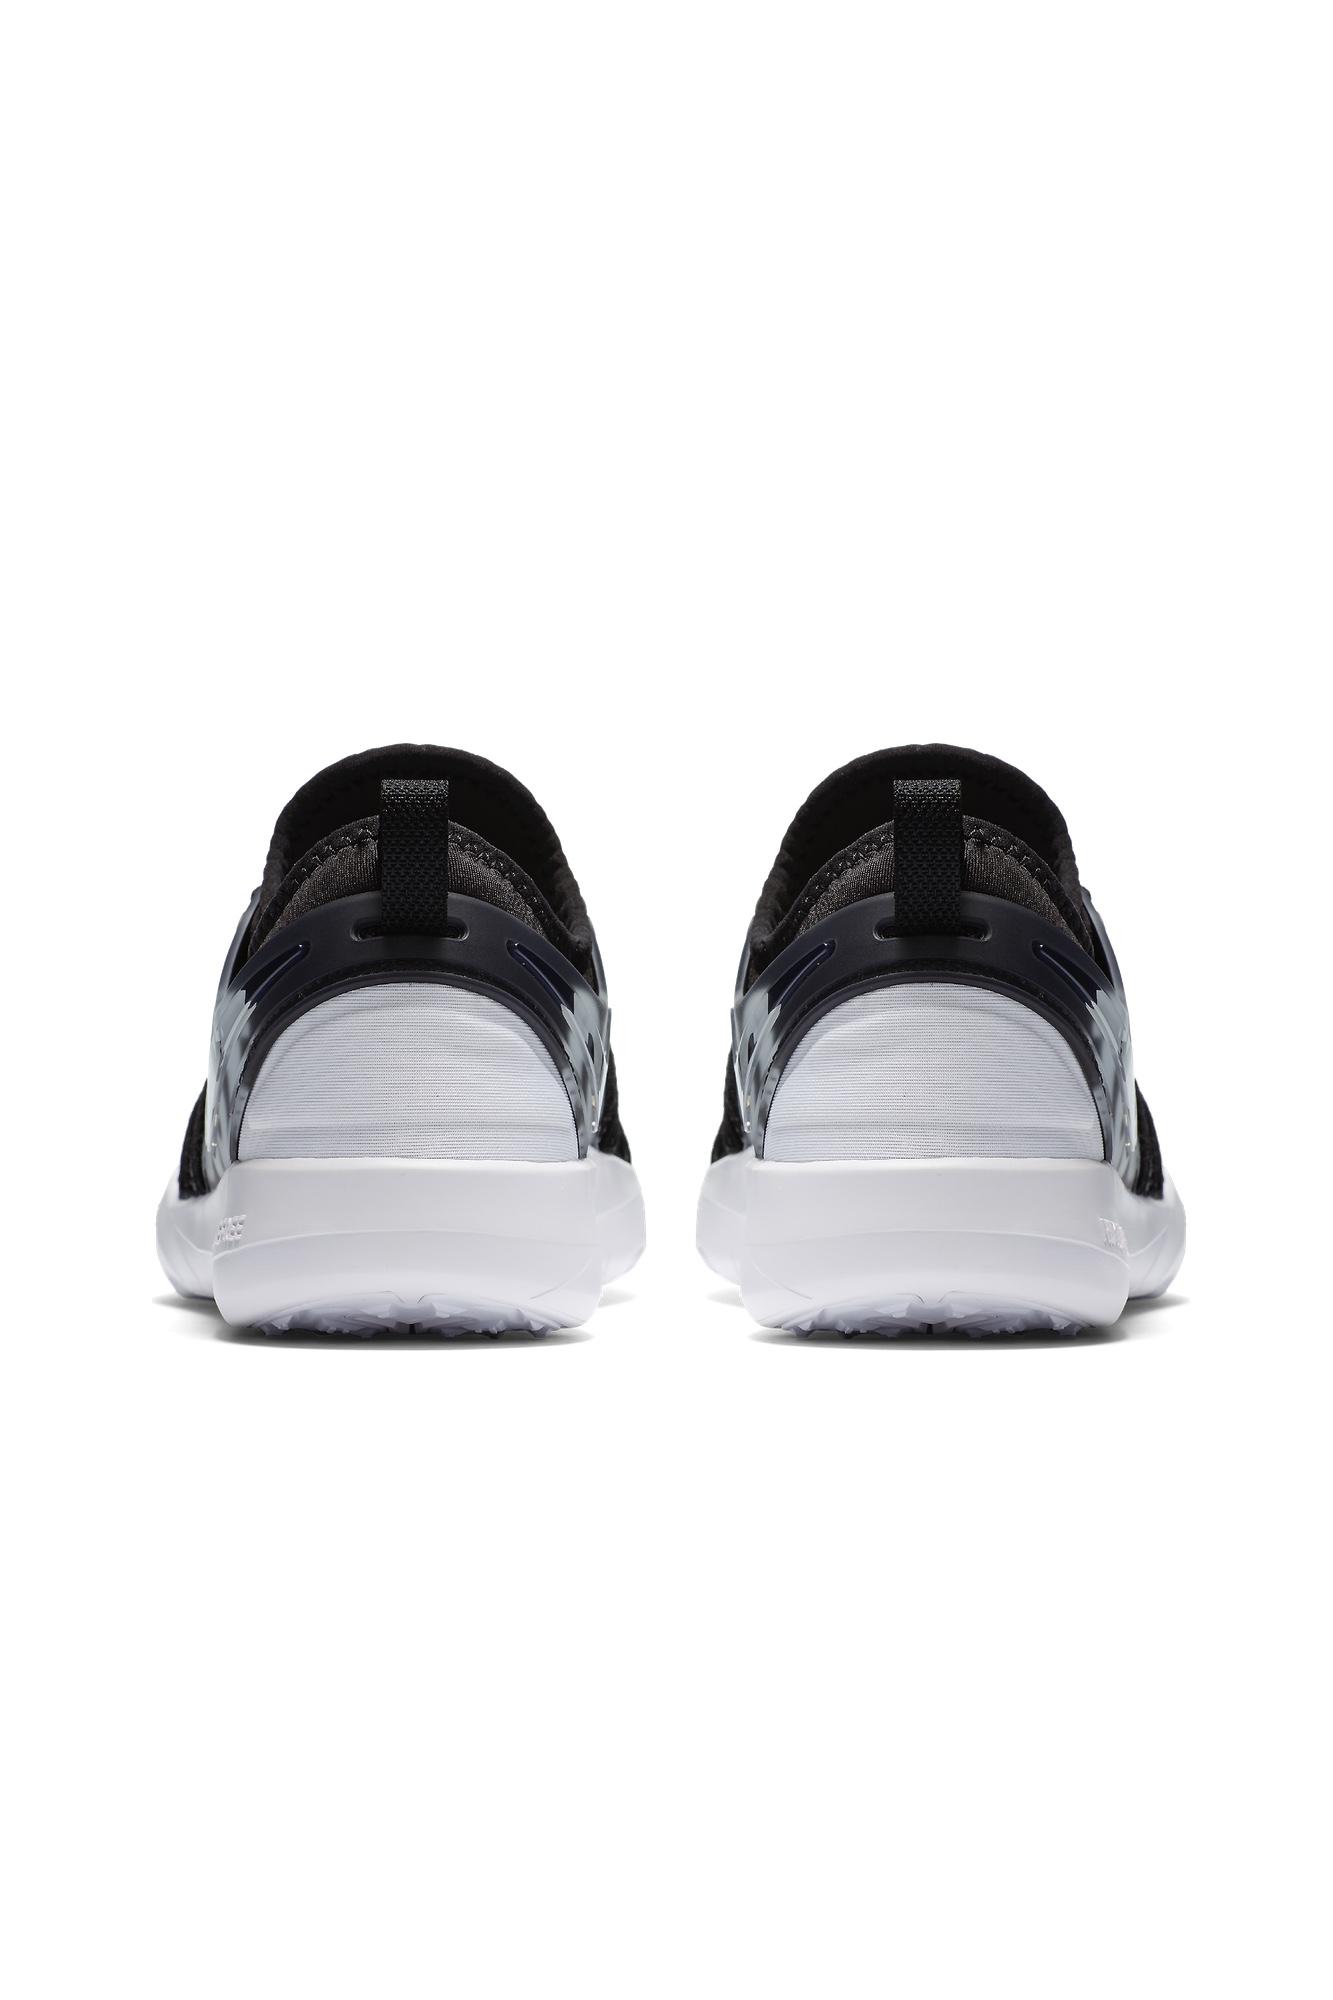 Buty Nike Free TR 7 Premium 924592 001 Treningowe Buty